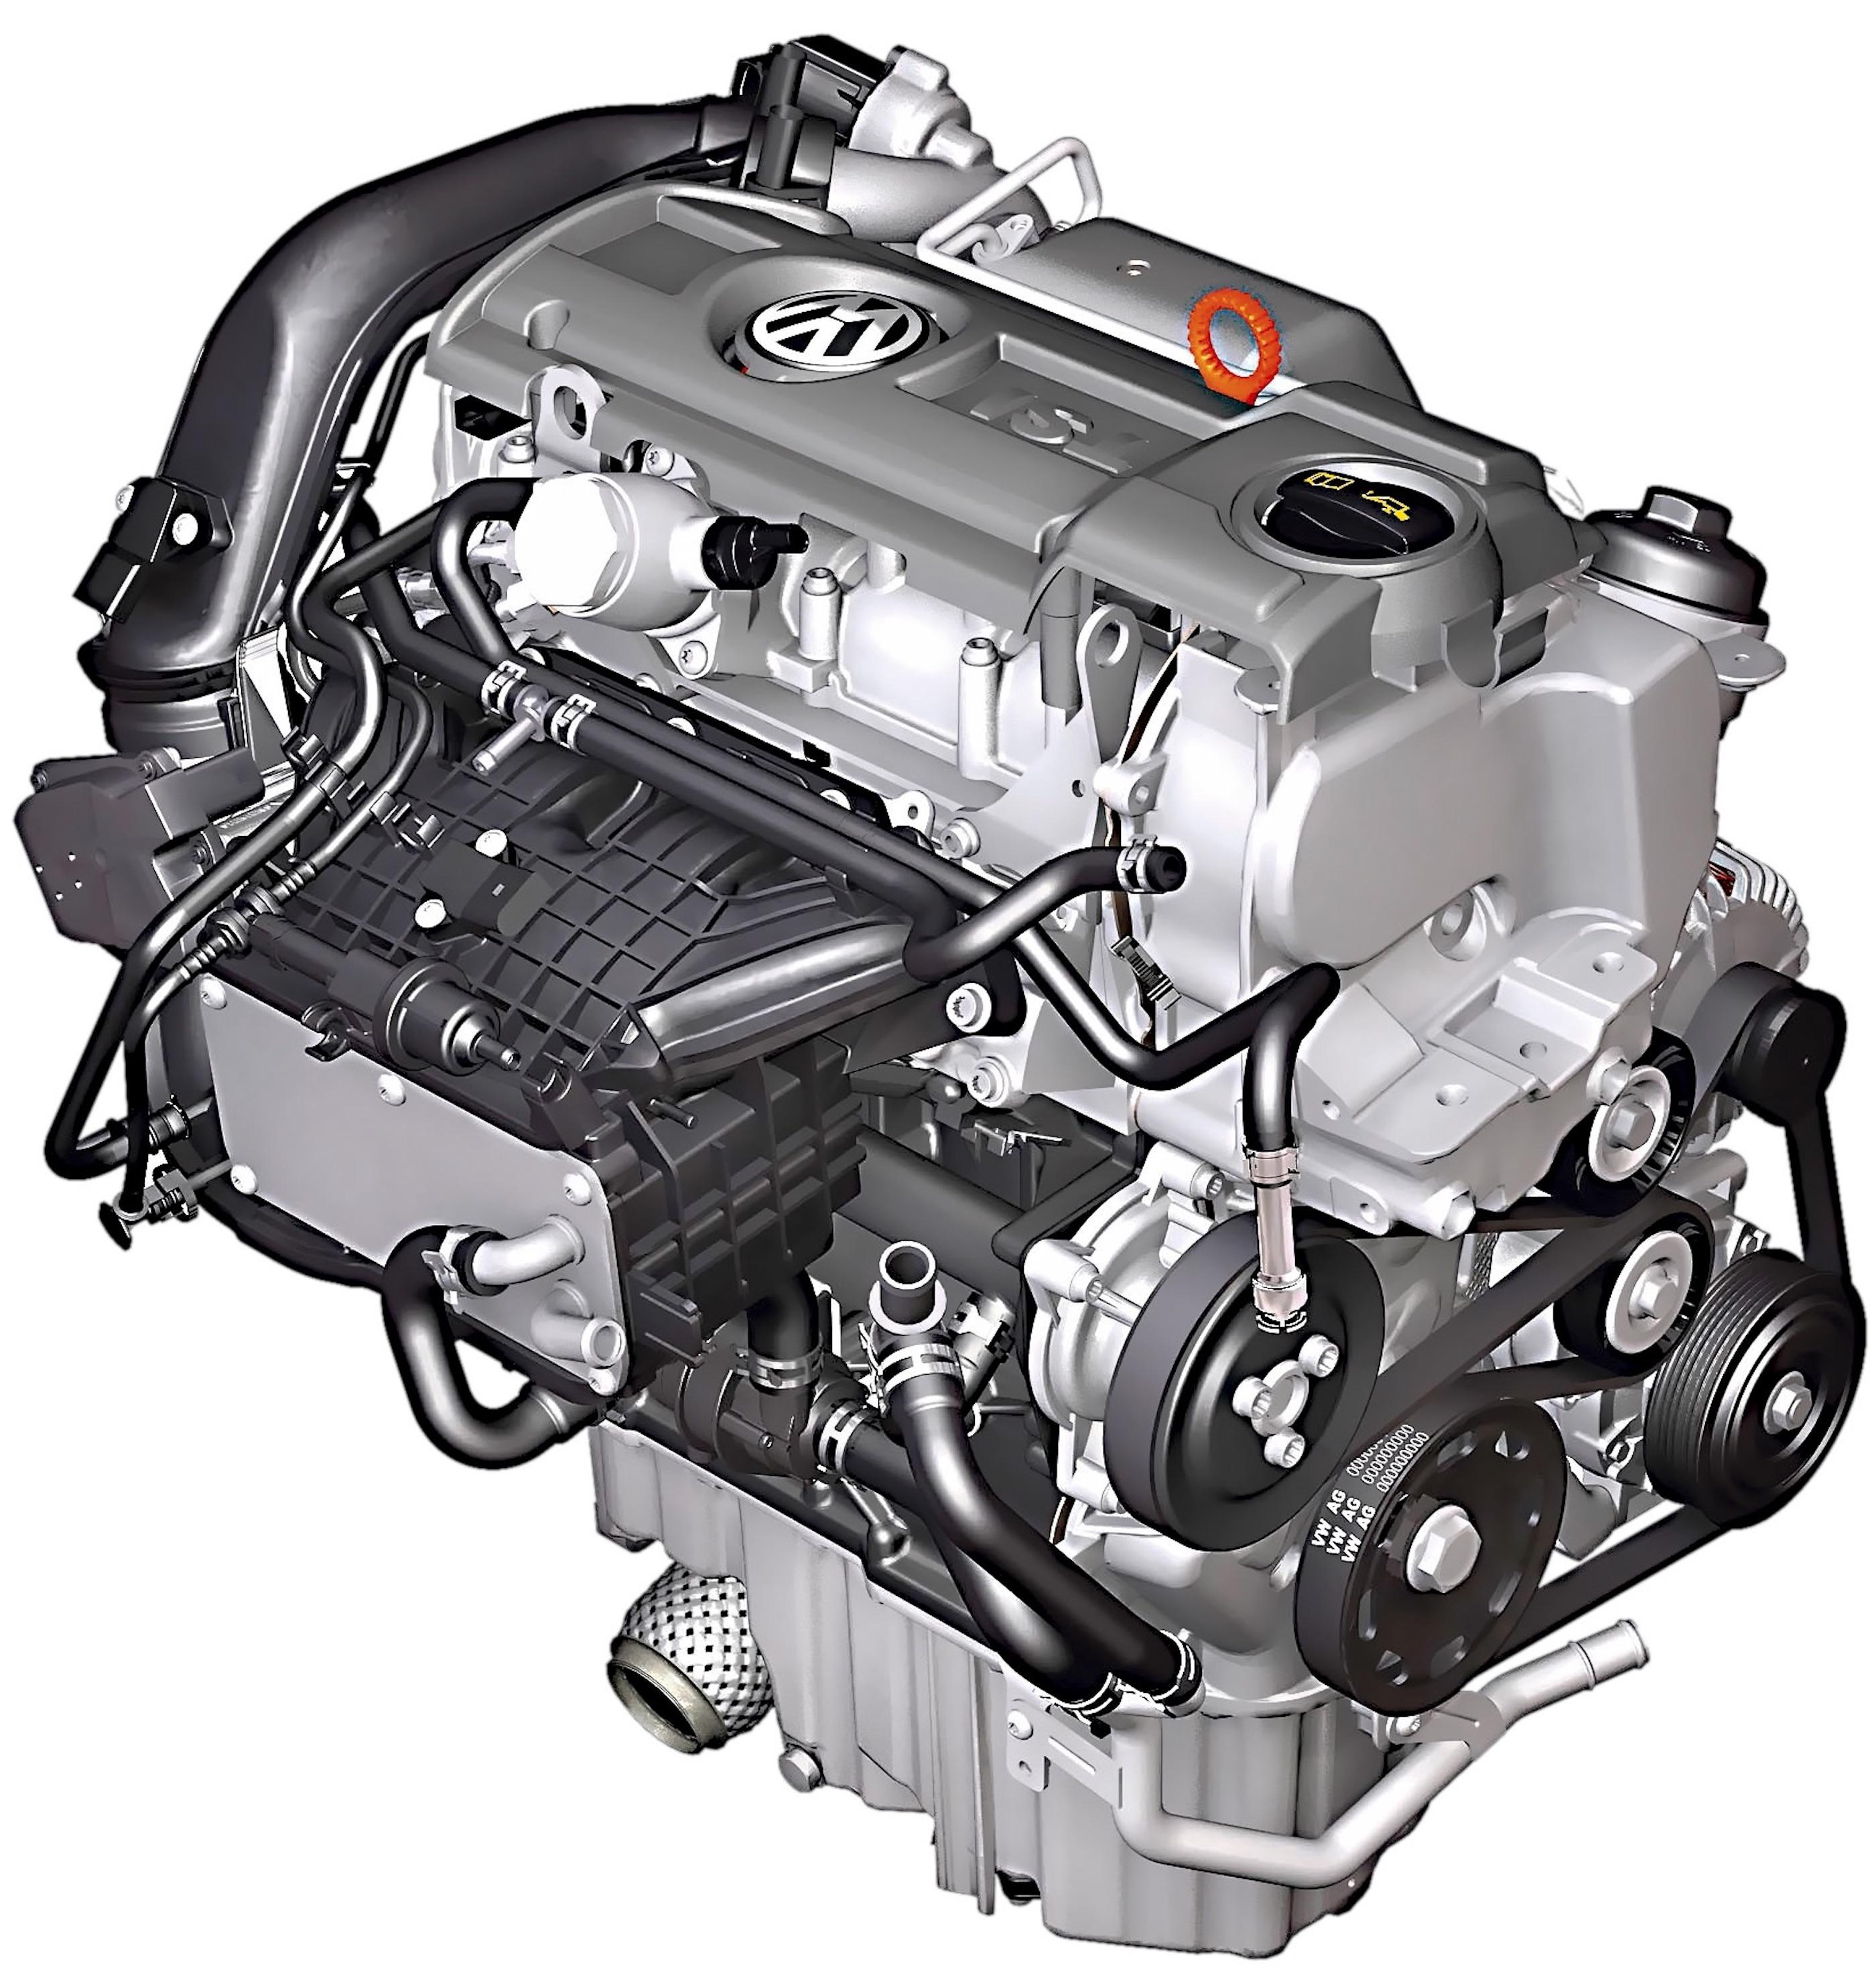 vw_1.4_tsi_90kw_122ps_engine_1_10